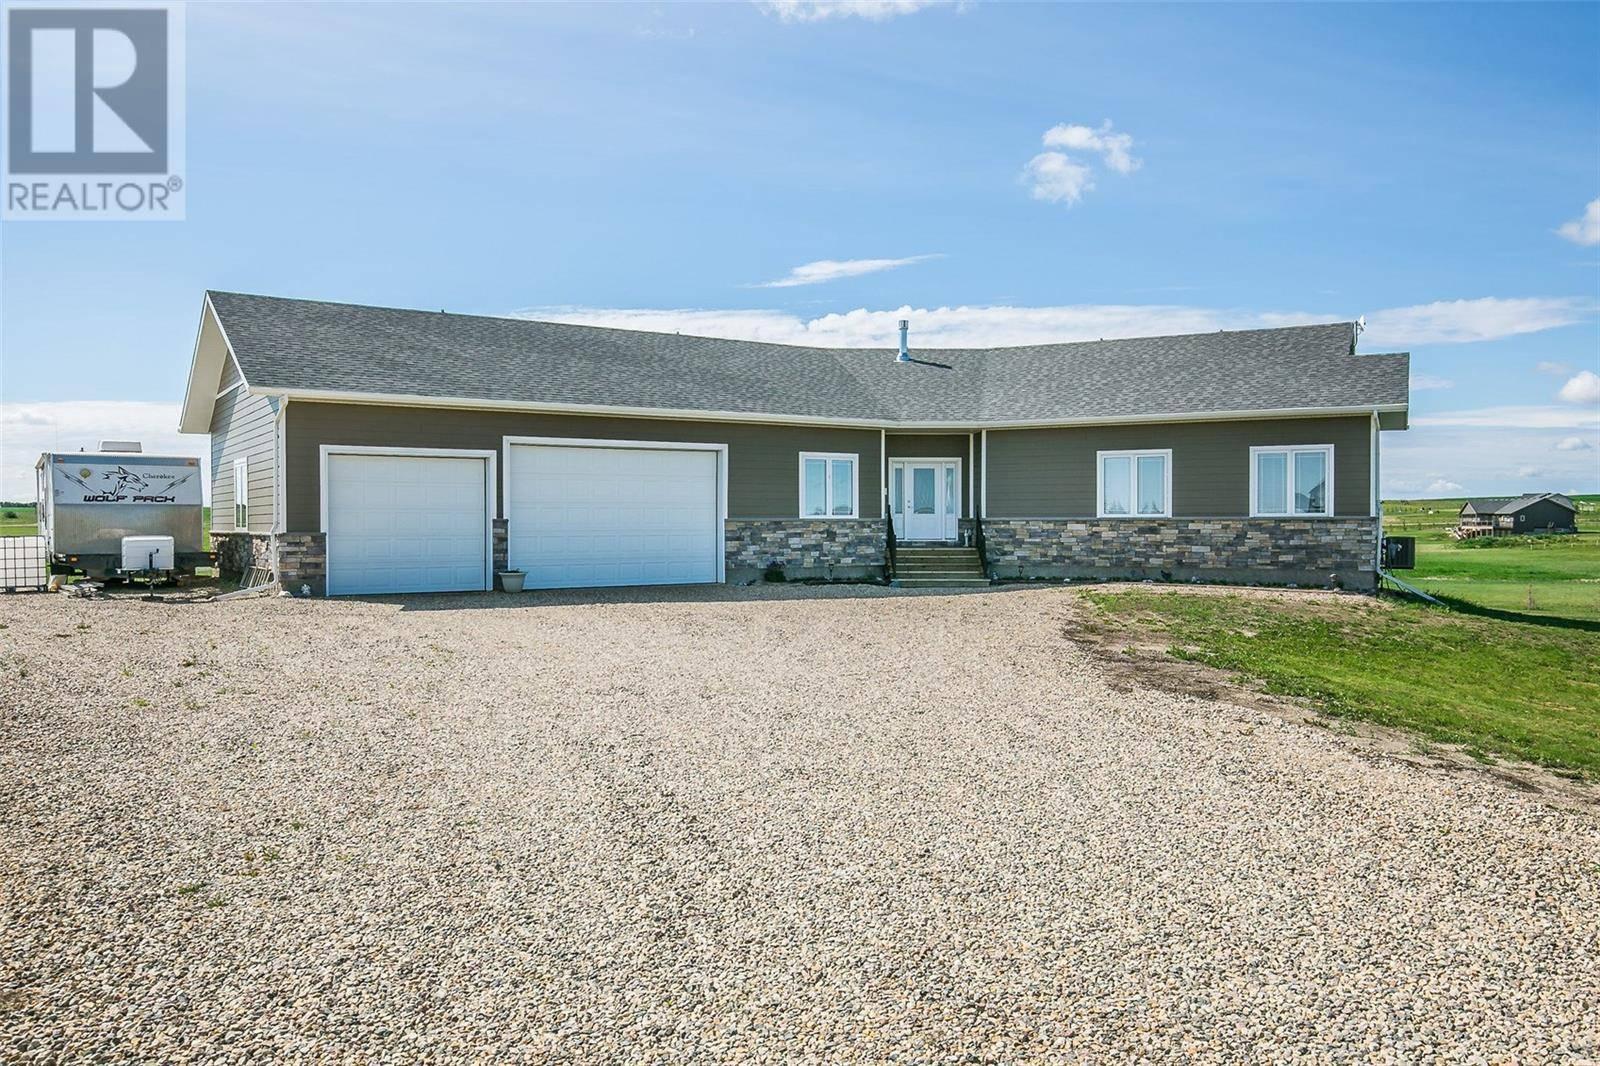 House for sale at 78 Meadowlark Cres Blucher Rm No. 343 Saskatchewan - MLS: SK778811